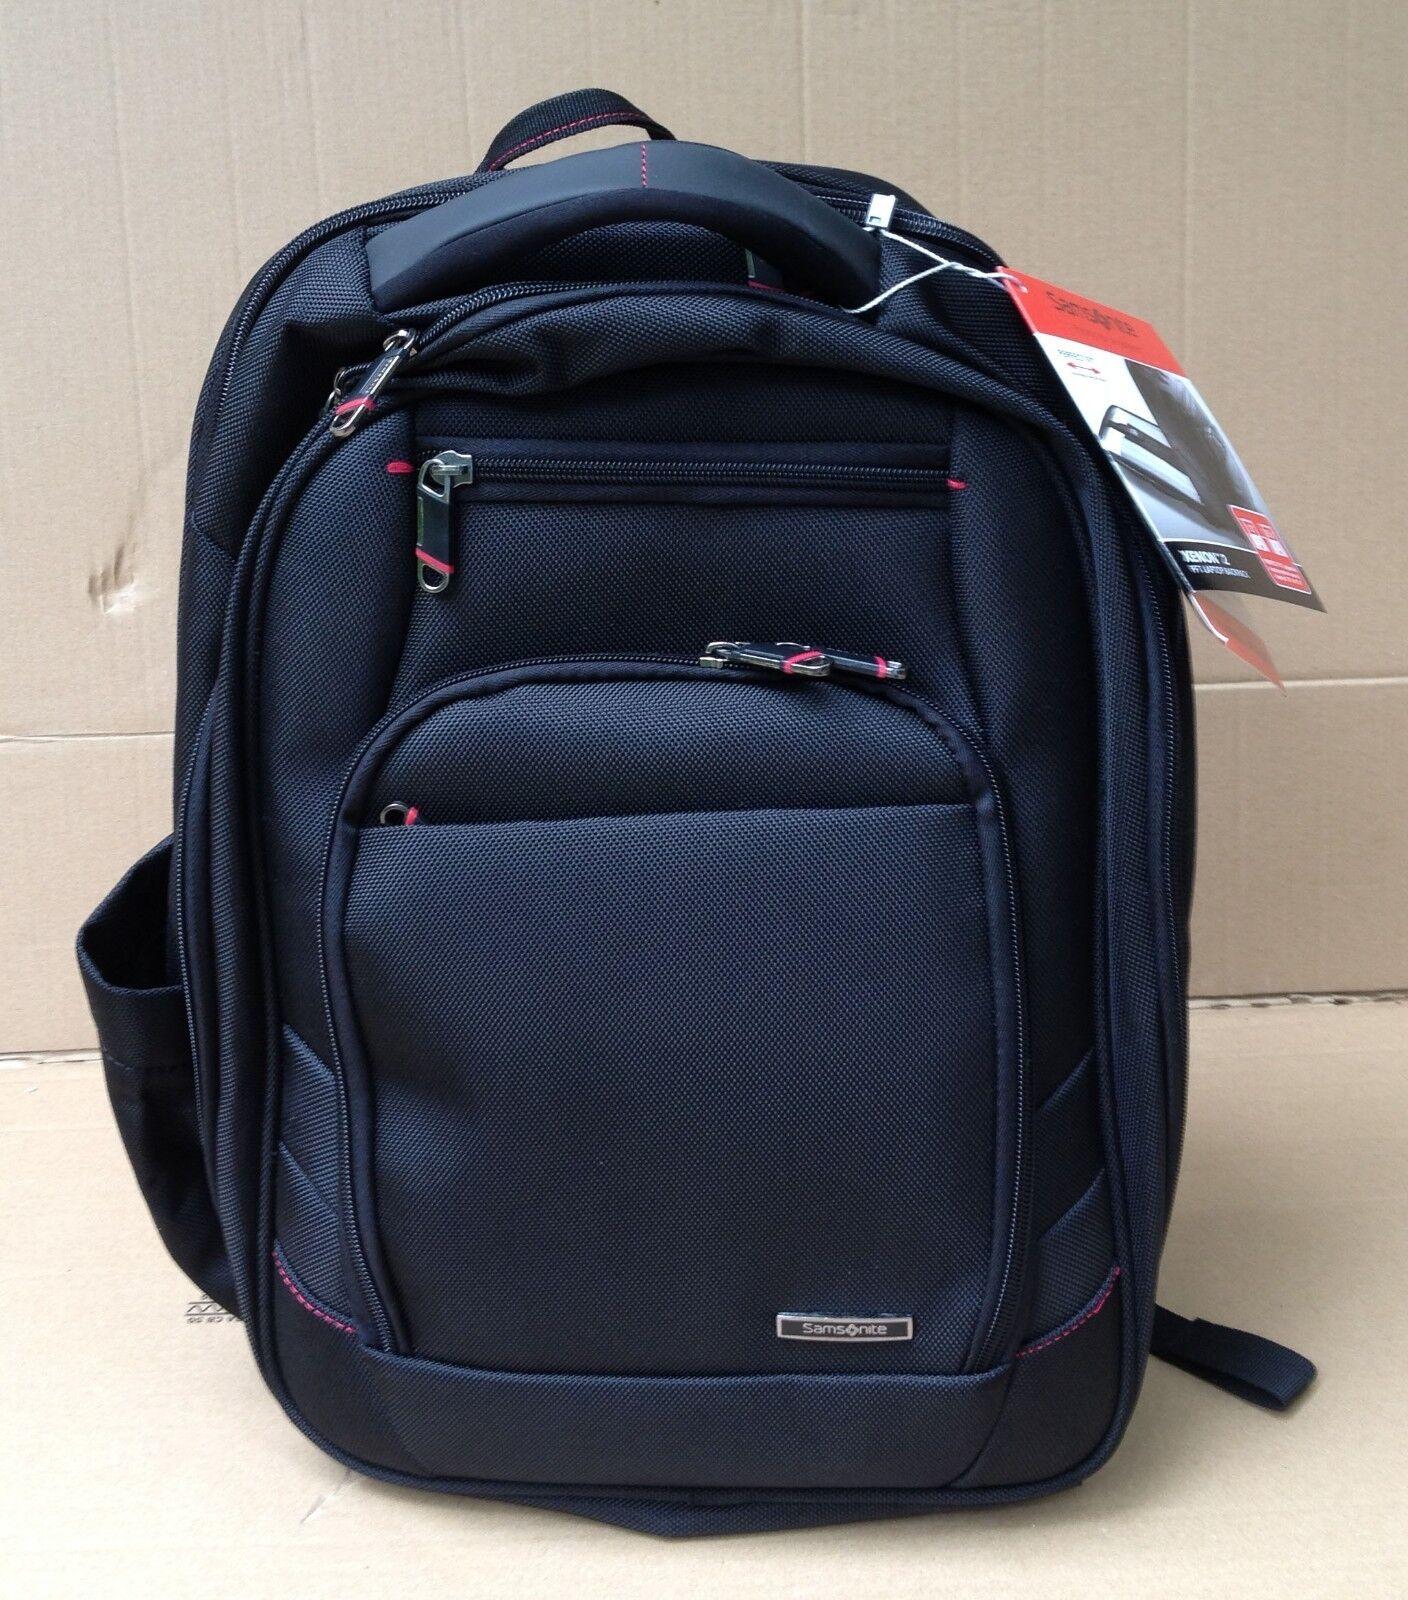 "Samsonite - Xenon 2 Laptop Backpack Black w/ 13-15.6"" Laptop"